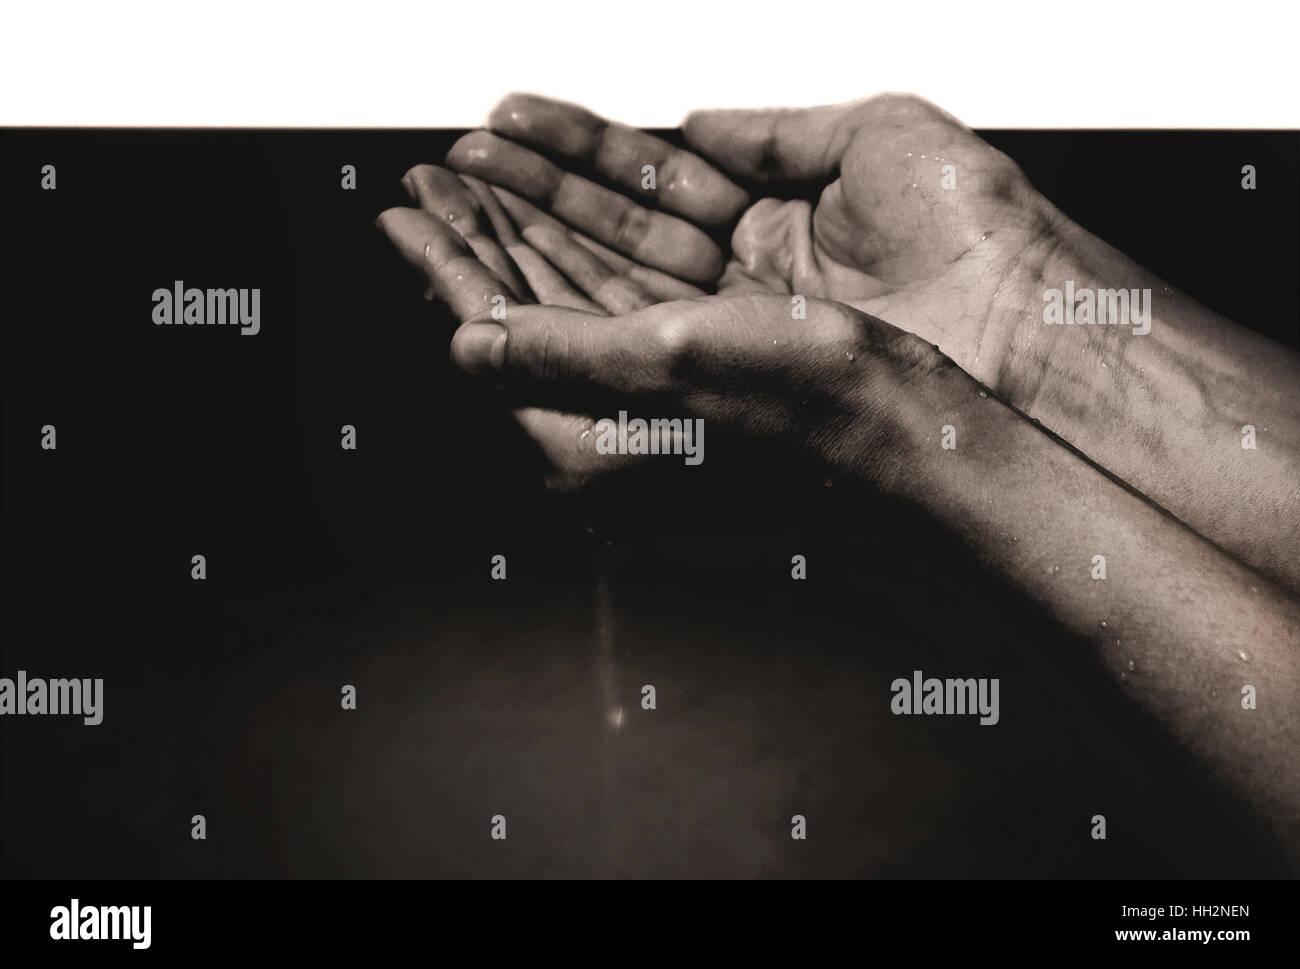 hands in oil - Stock Image